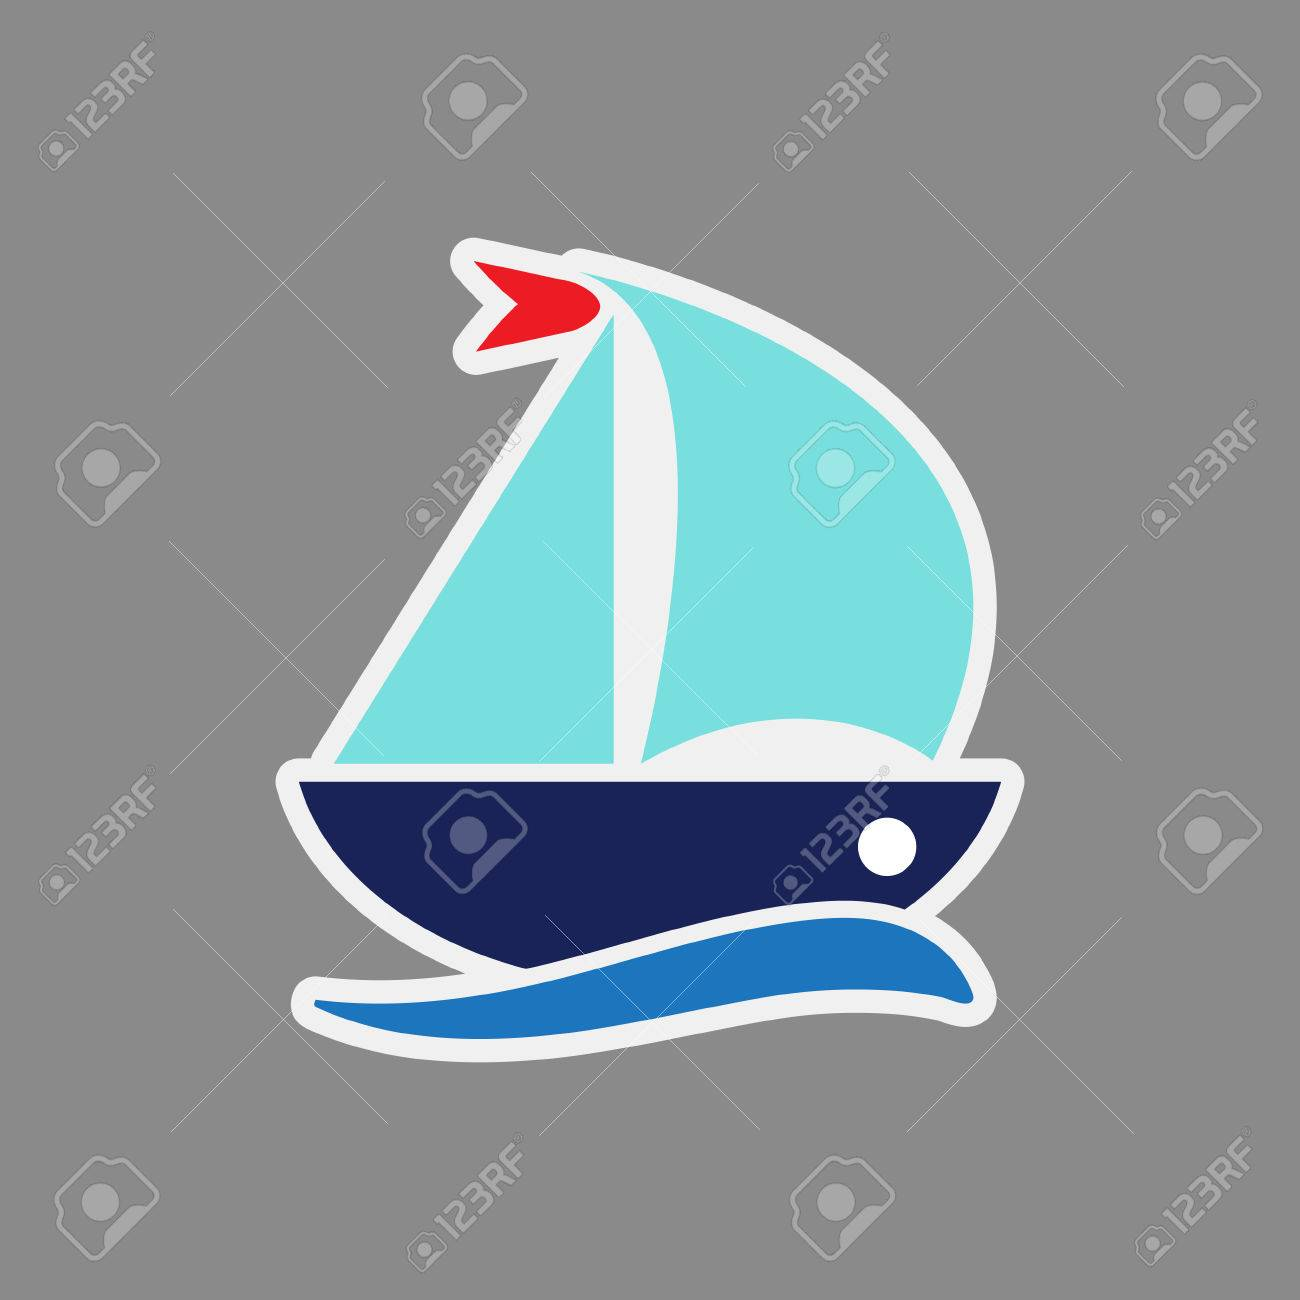 Autocollant D Icône De Navire Dessin Animé Ship Logo Illustration